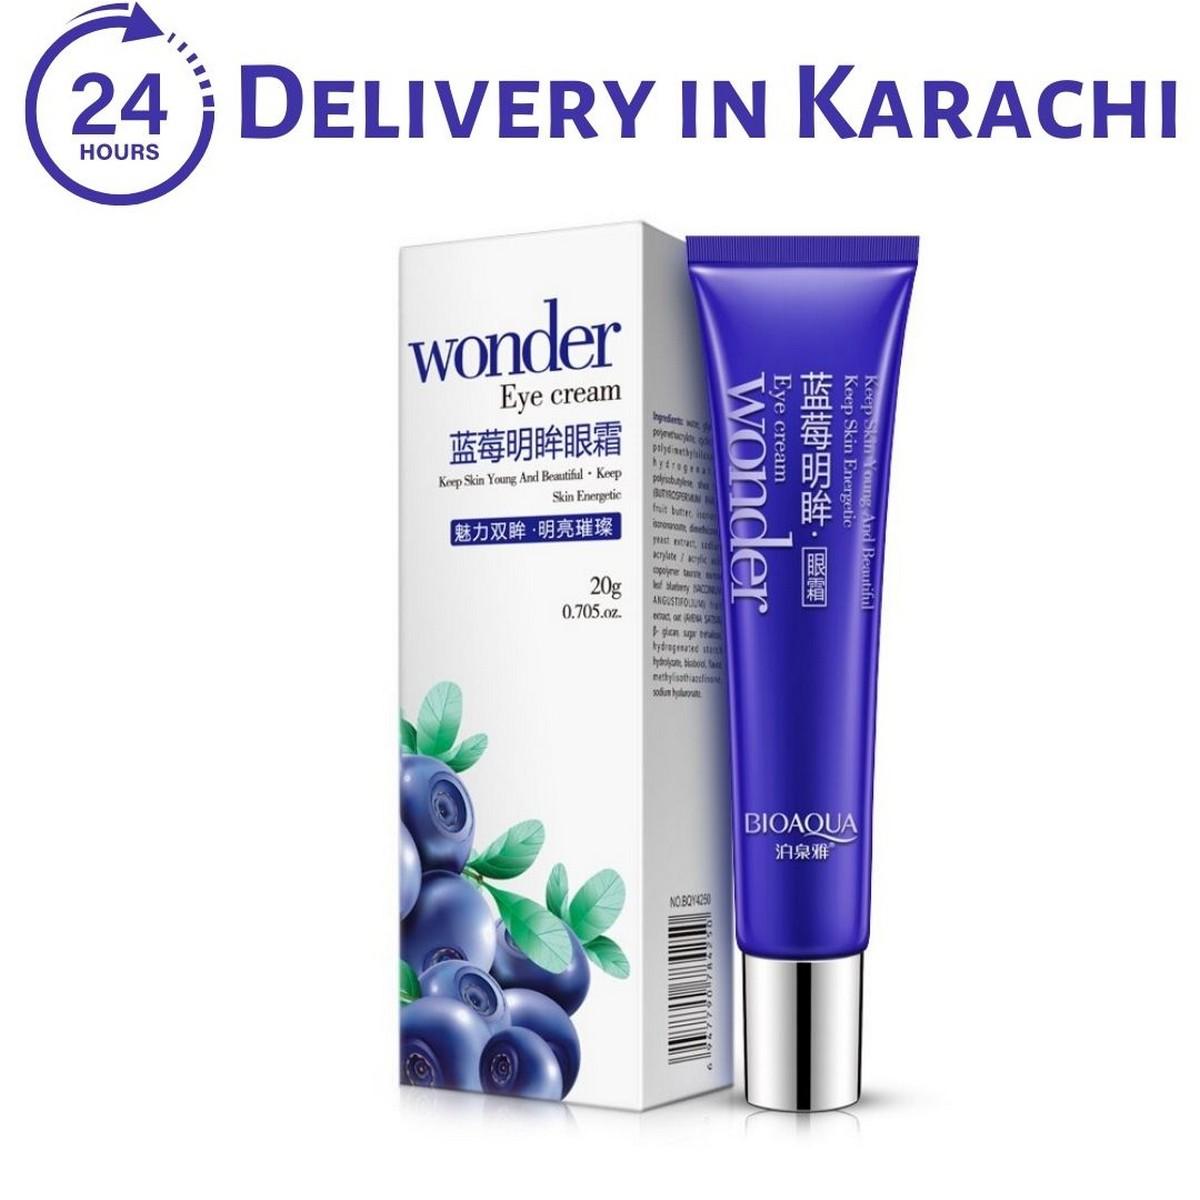 BIOAQUA Wonder Blueberry Eye Cream - Dark Circle Wrinkles Remover Moisturizing Anti Puffiness Eye Care Cream